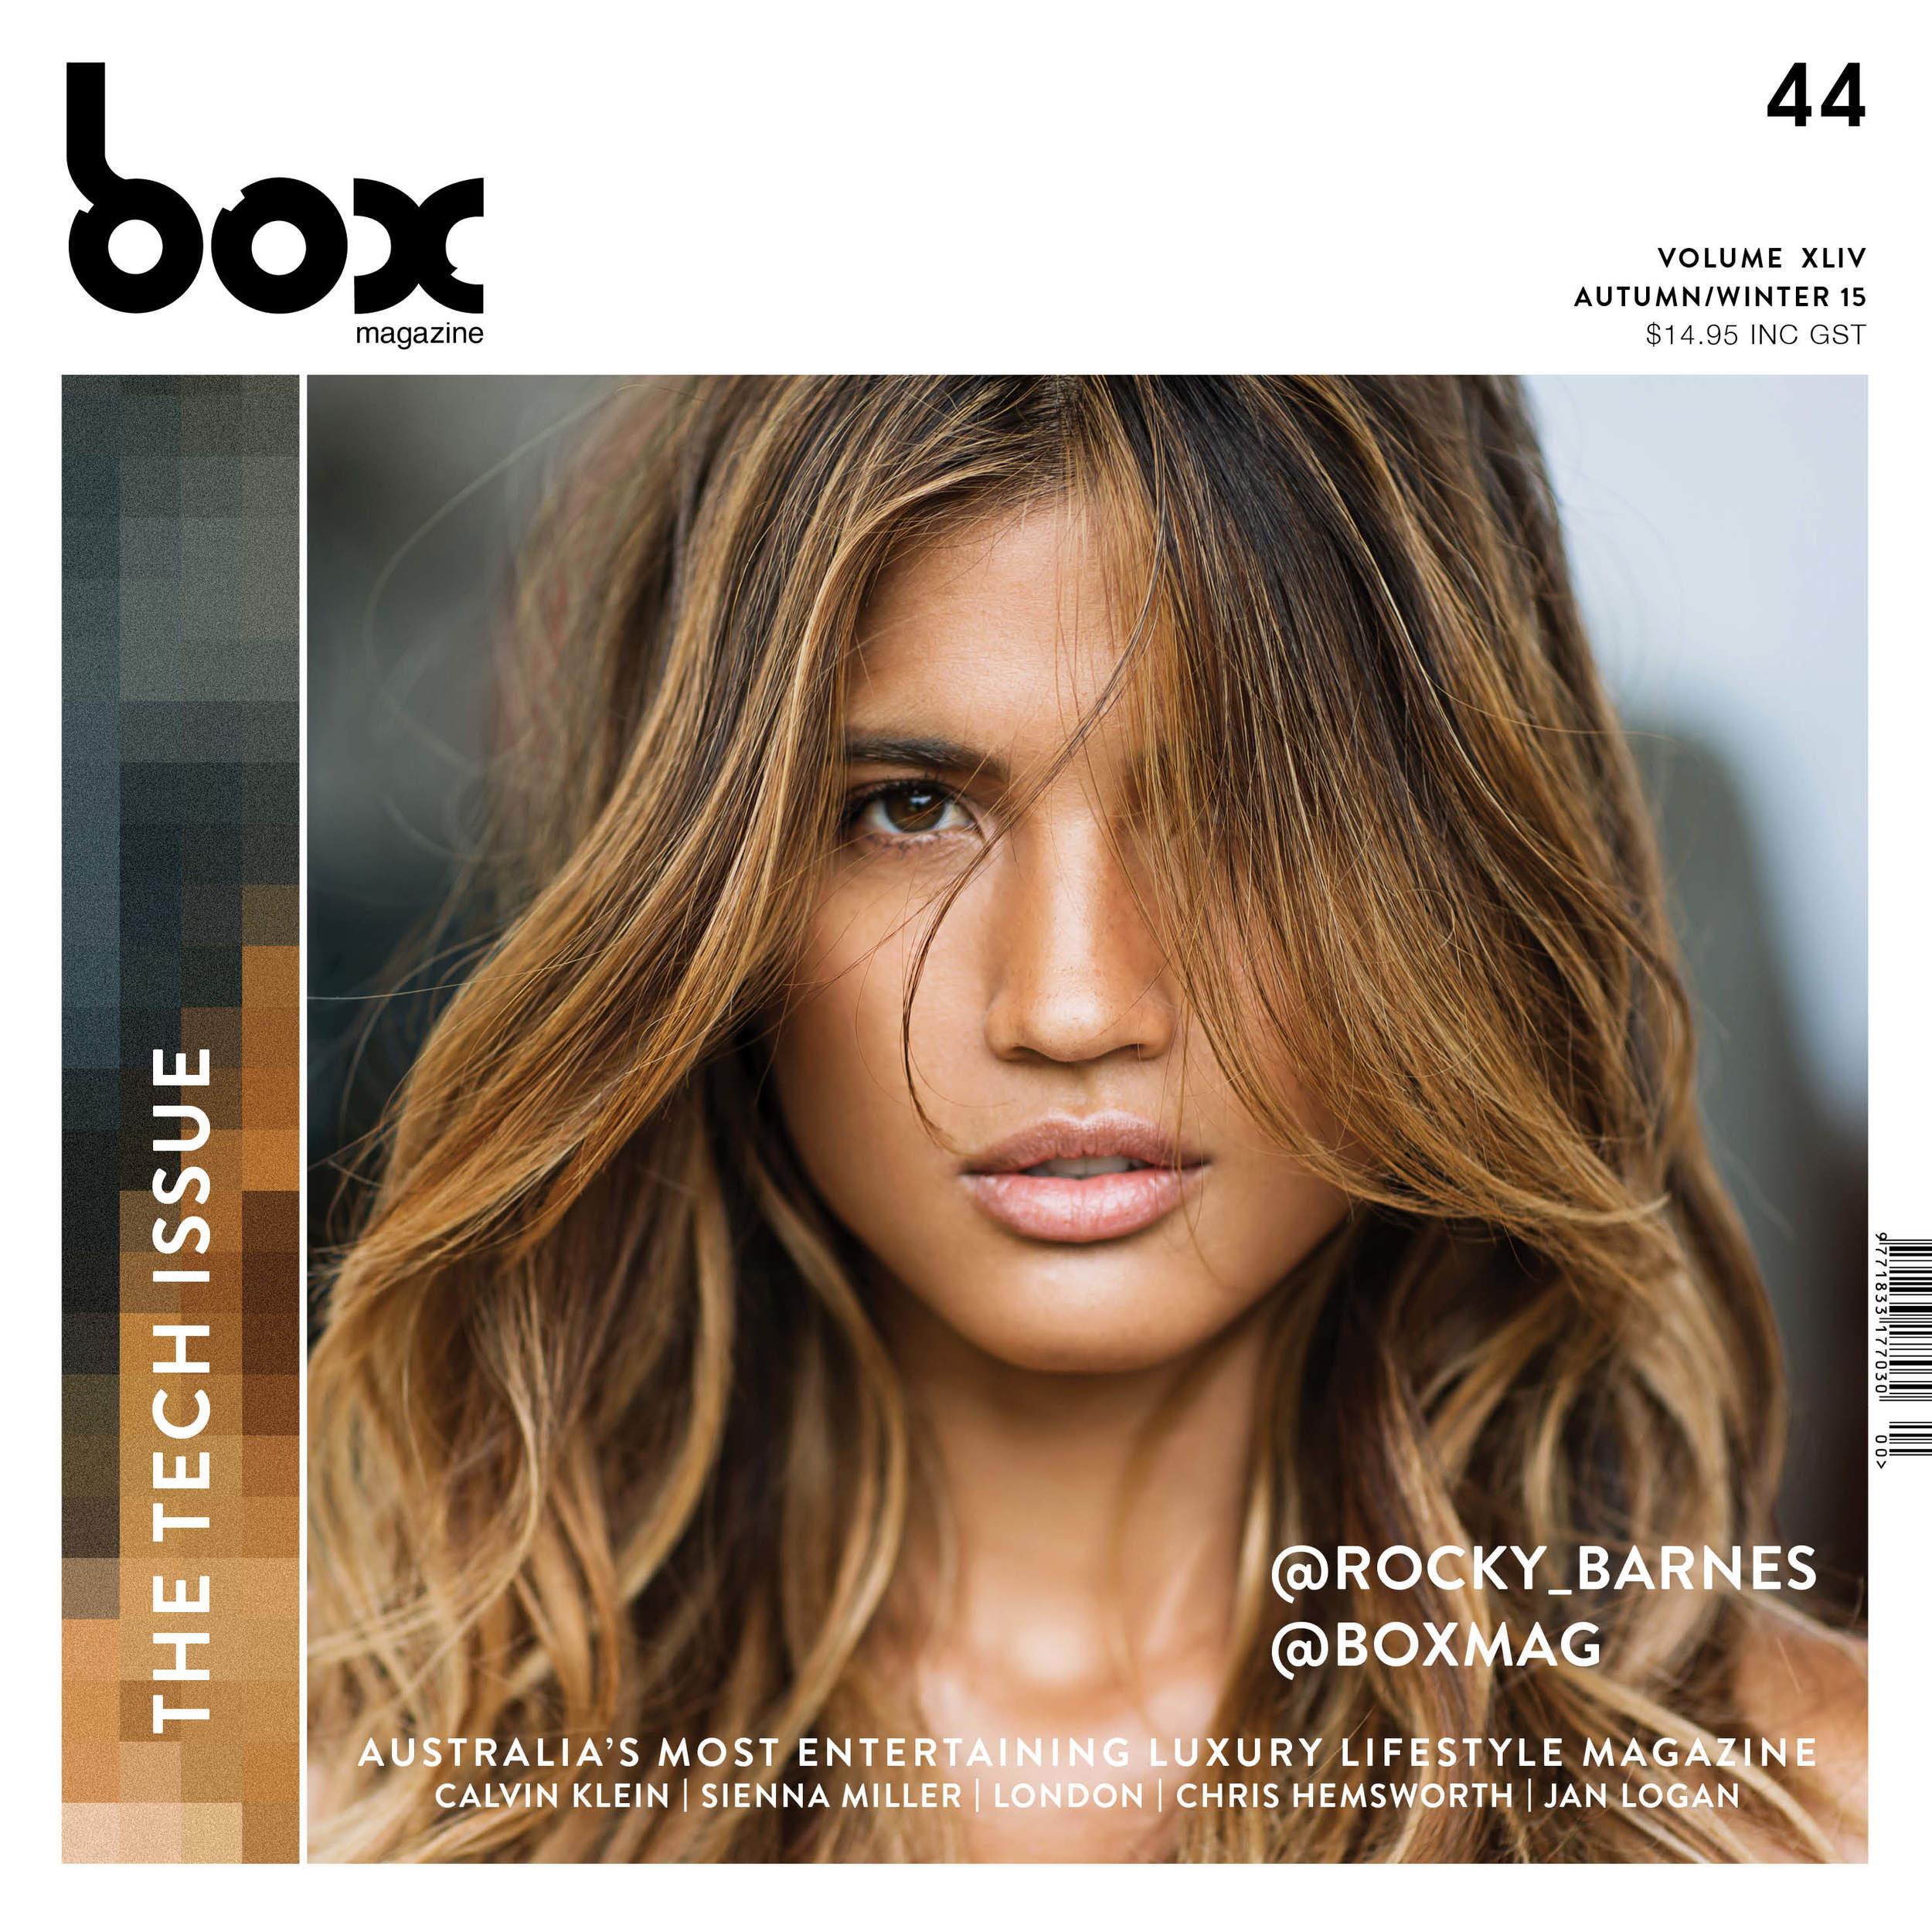 BOX_SS_2015_COVER_LR.jpg